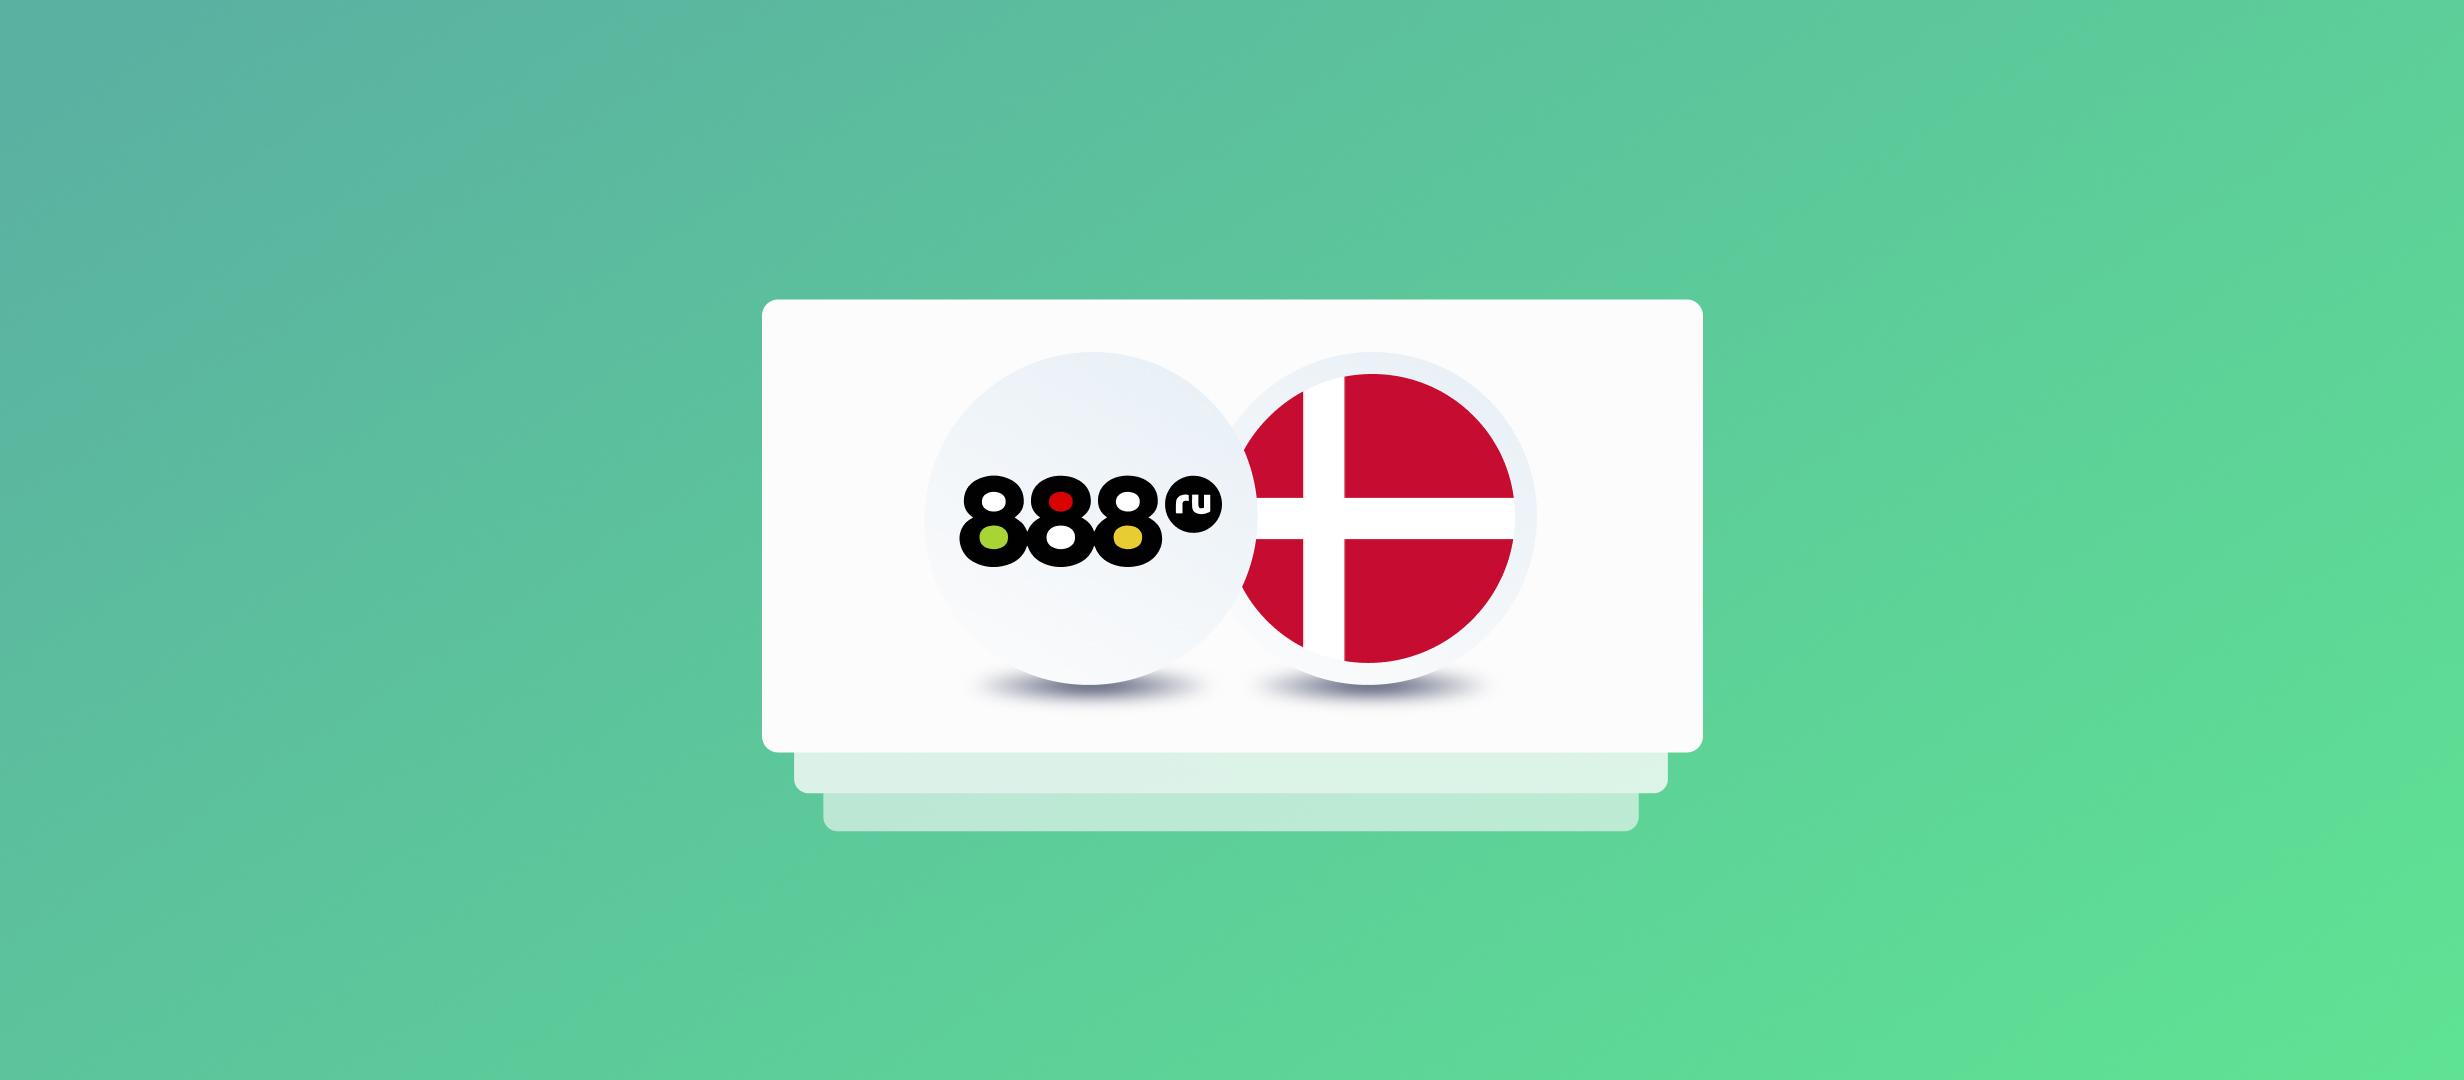 Клиенты БК 888, поставившие на проход Дании в финал Евро, получат фрибет на сумму ставки